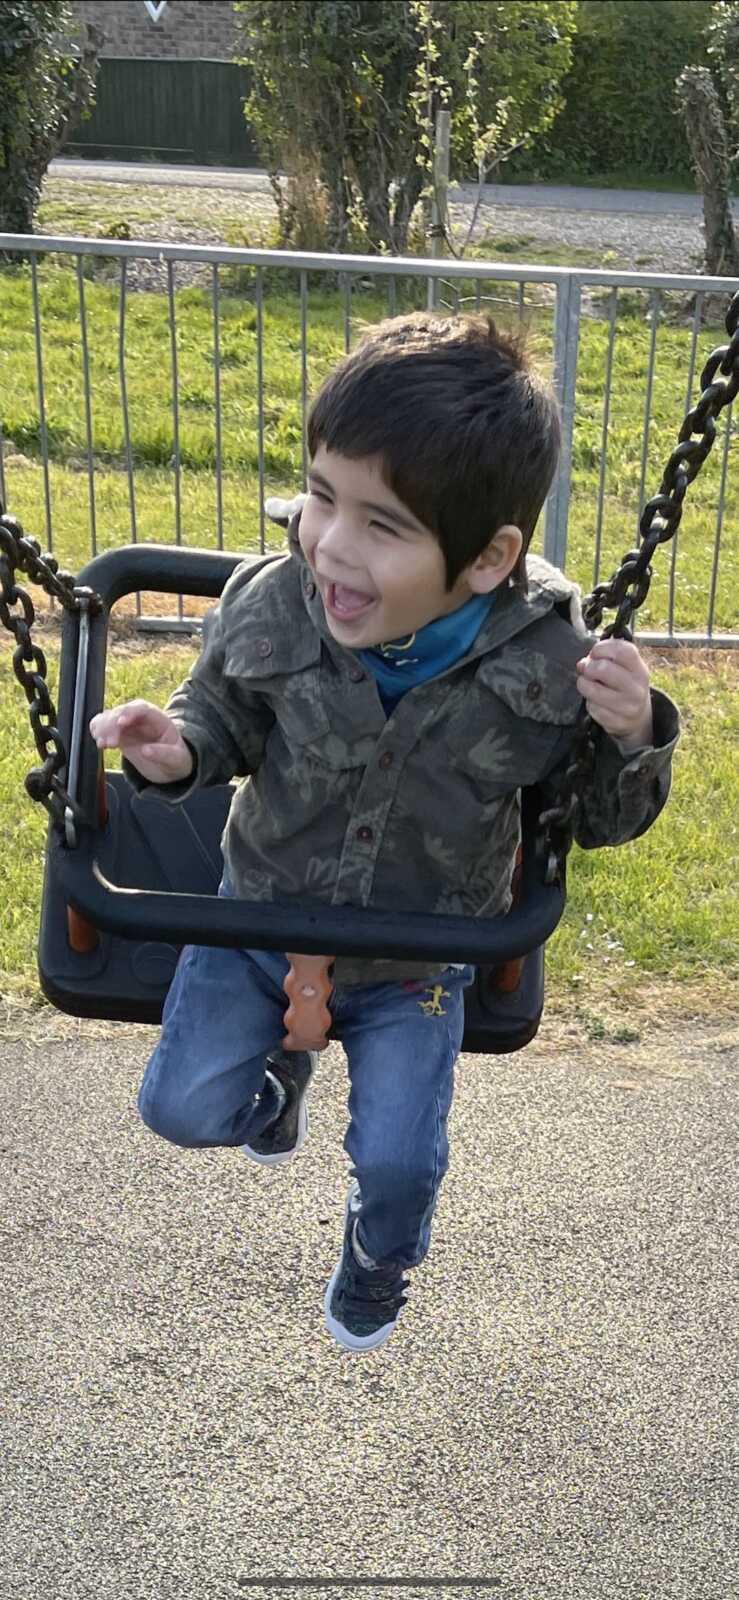 son having fun outside on the swing